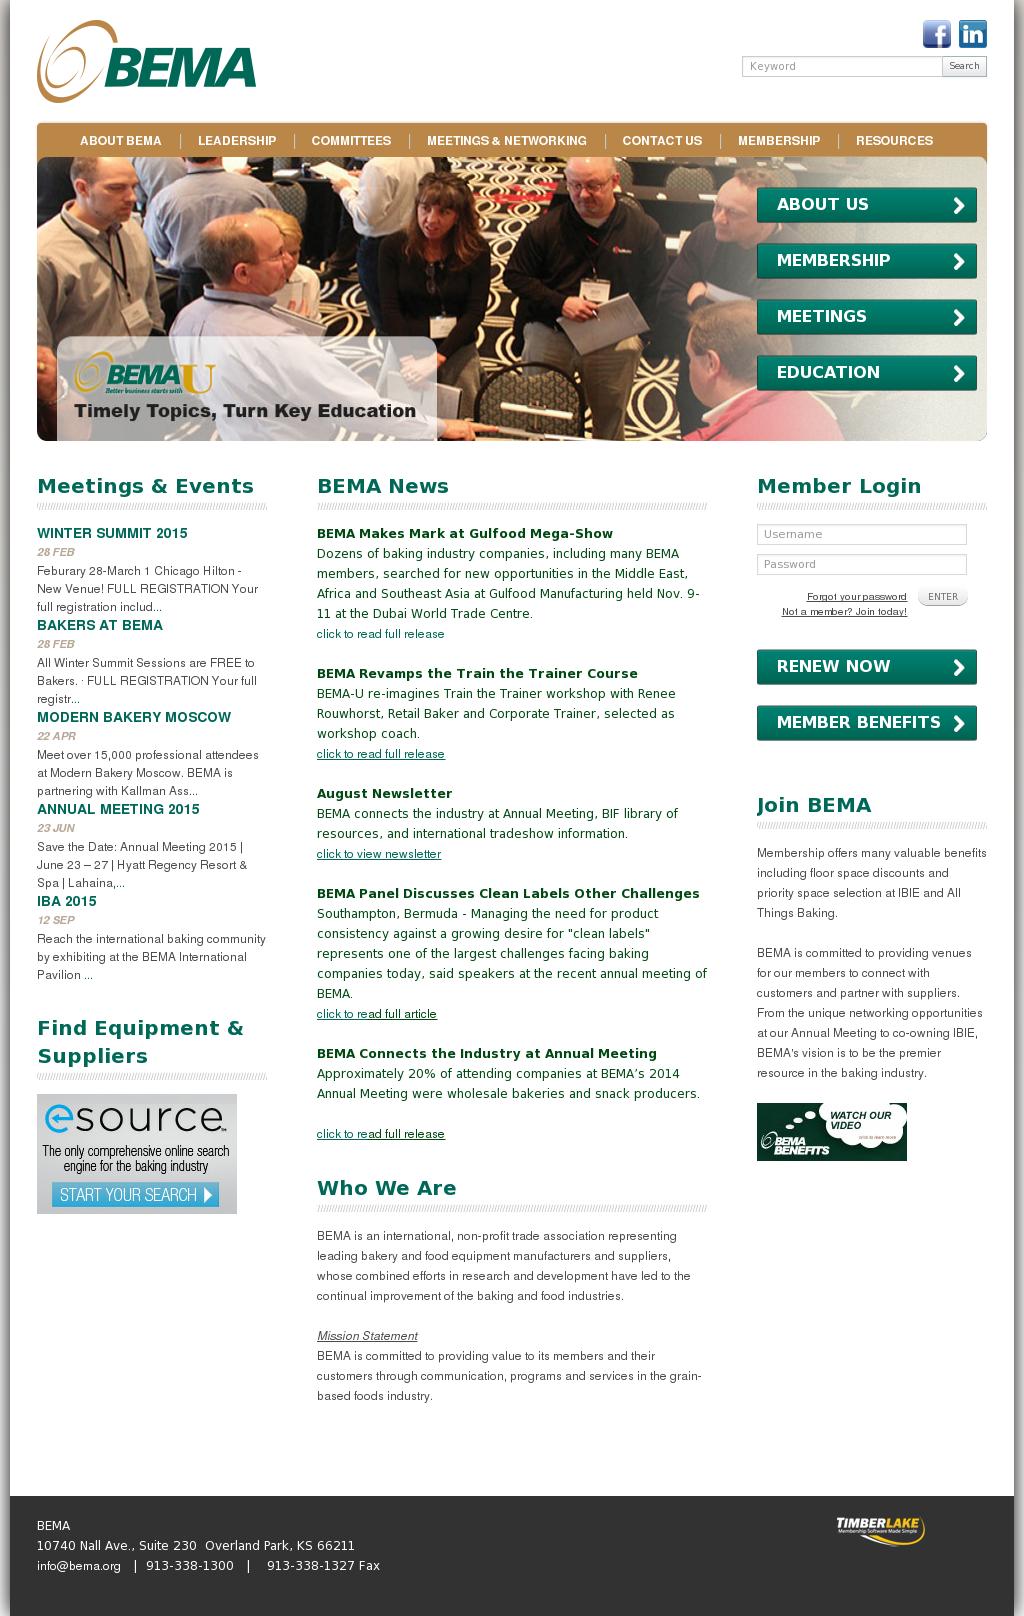 Bema Competitors, Revenue and Employees - Owler Company Profile